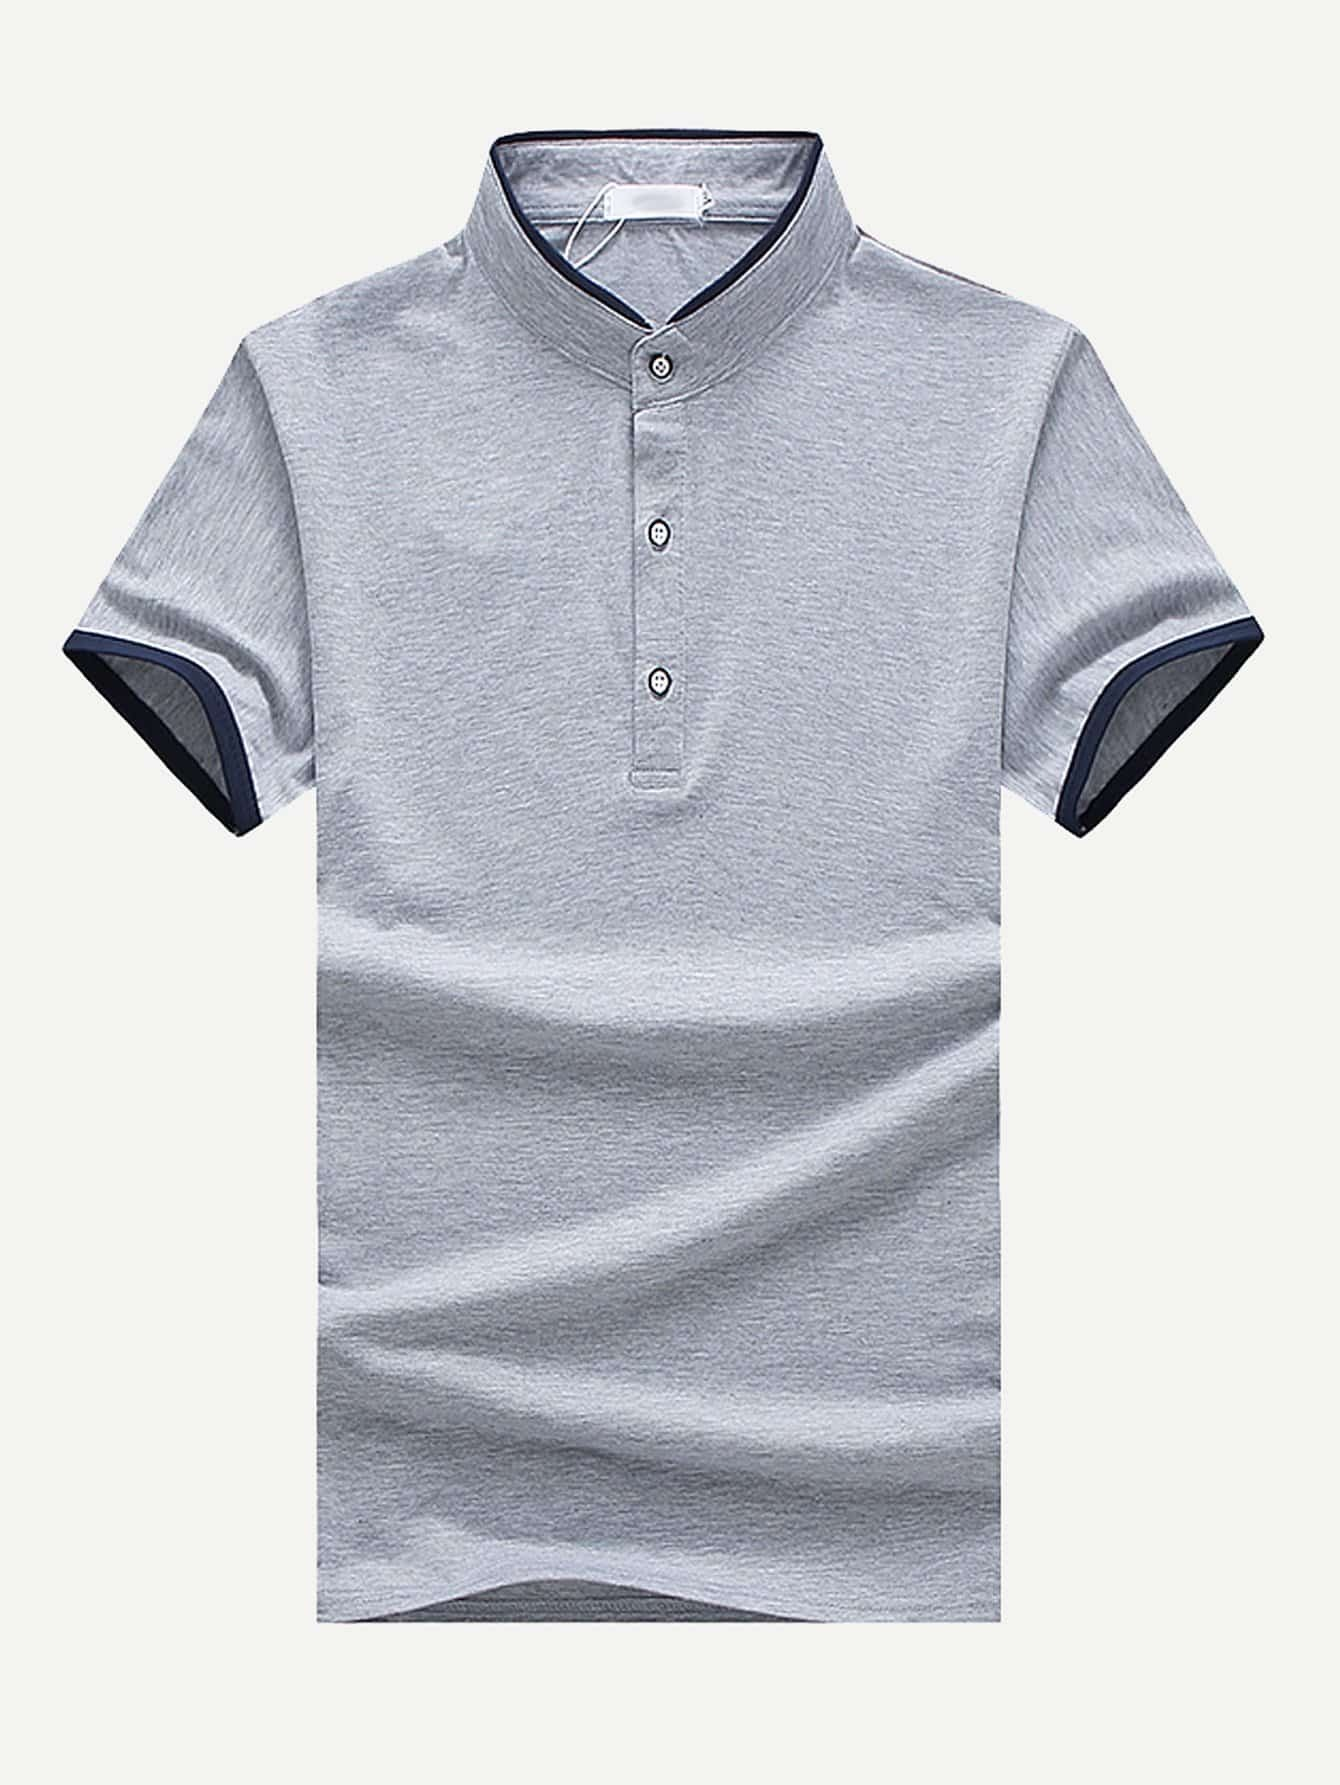 Men Ringer Polo Shirt roamer часы roamer 941 637 41 53 90 коллекция saturn